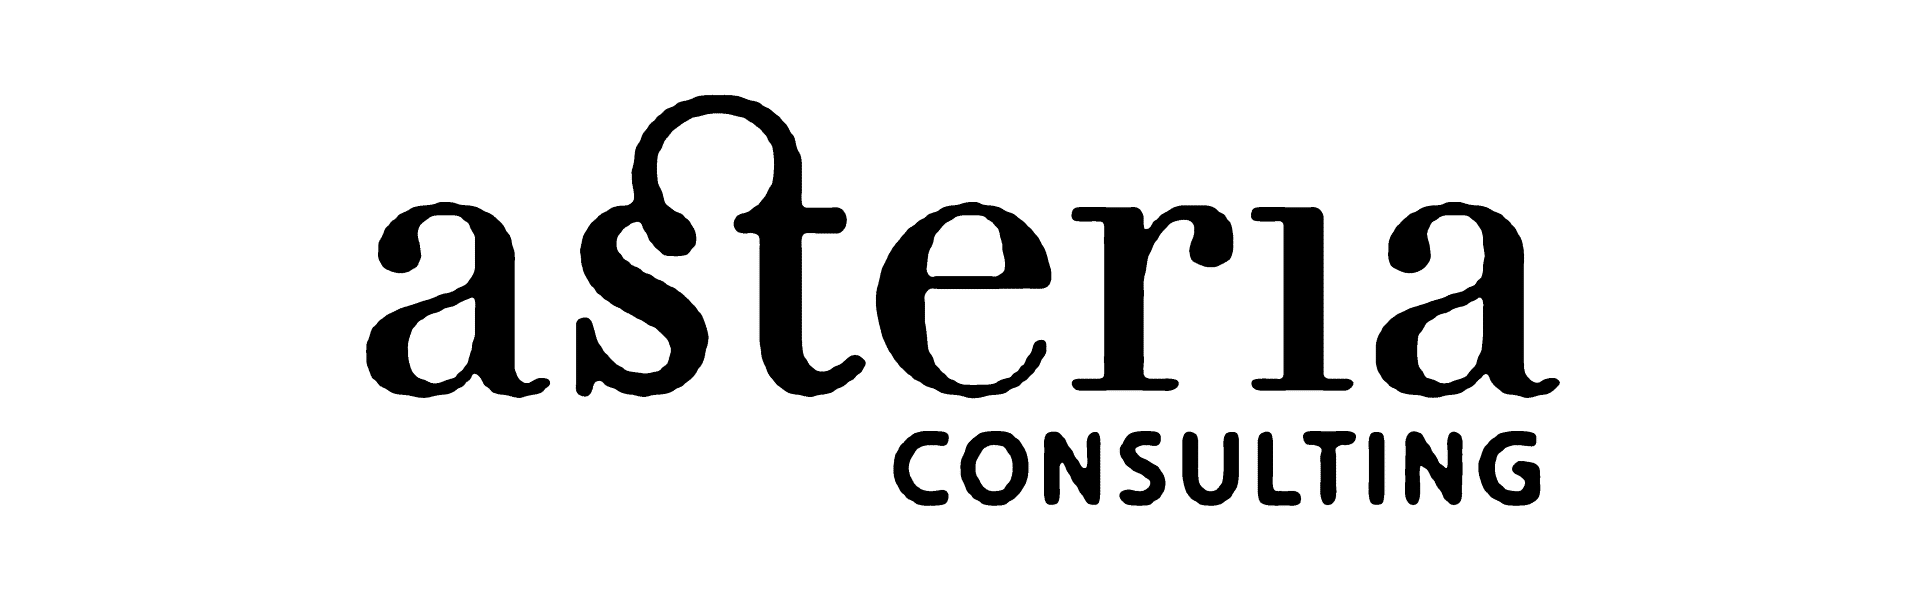 asteria consulting logo